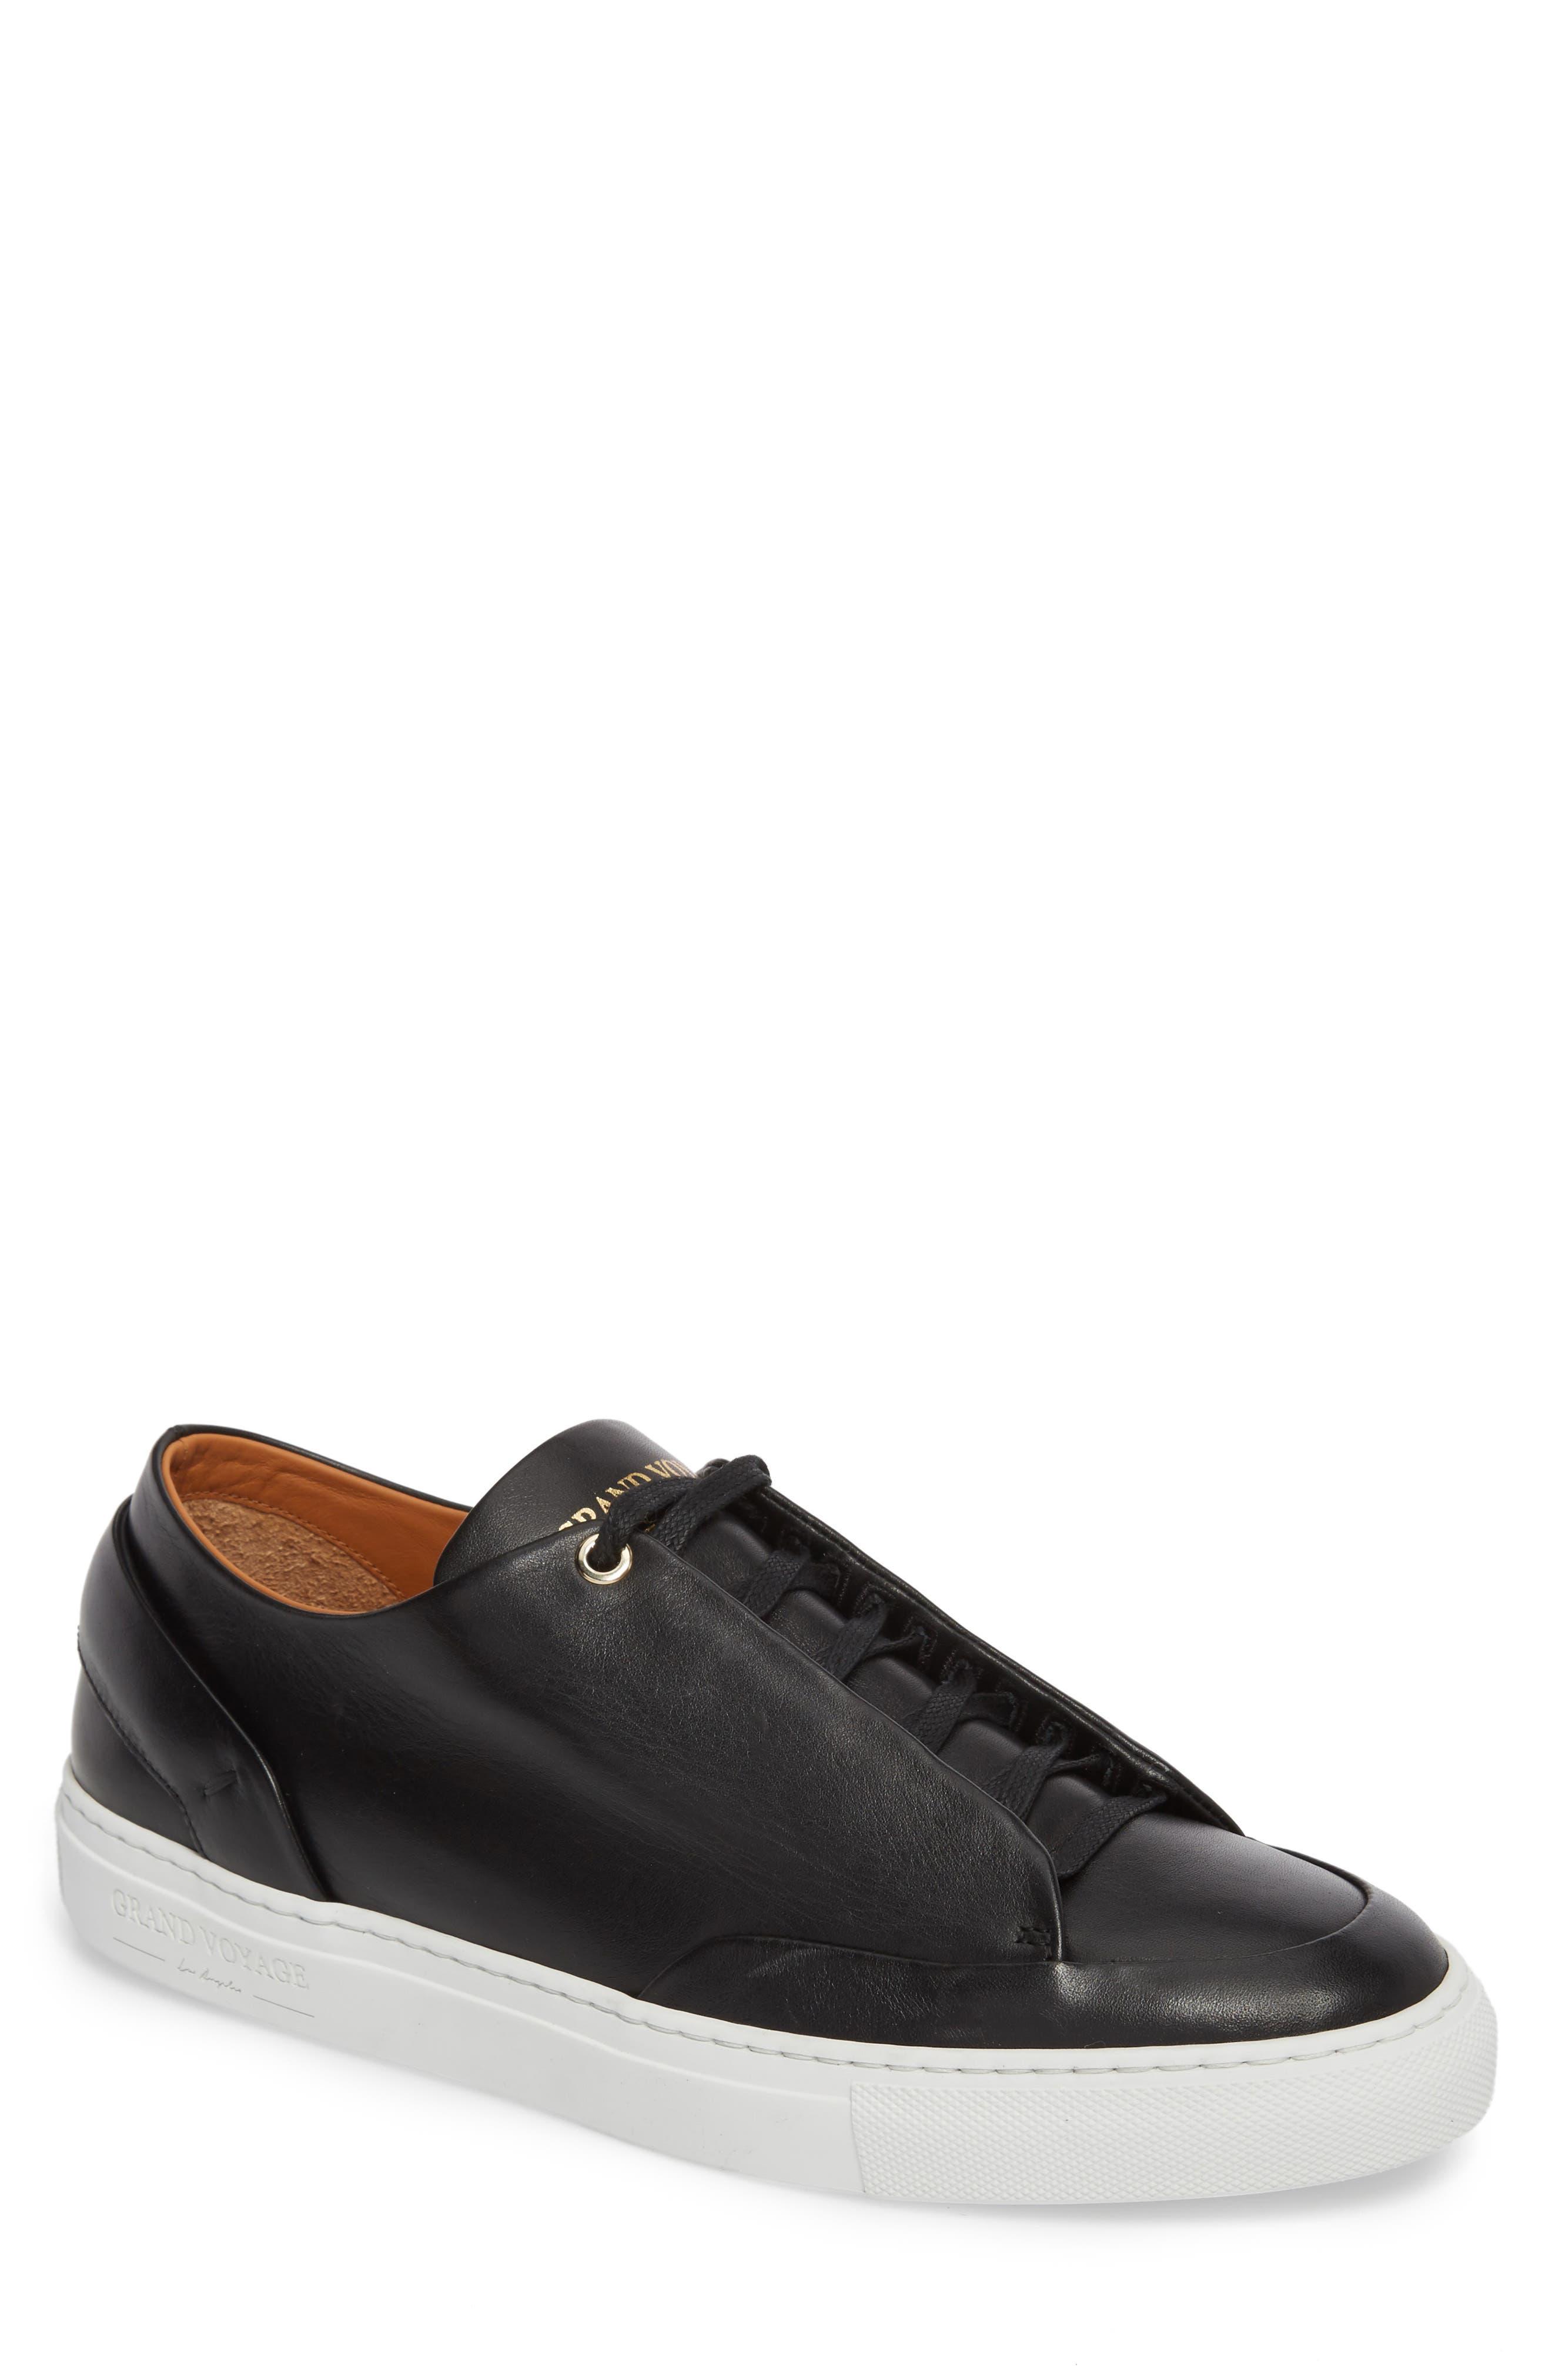 Avedon Sneaker,                             Main thumbnail 1, color,                             BLACK LEATHER